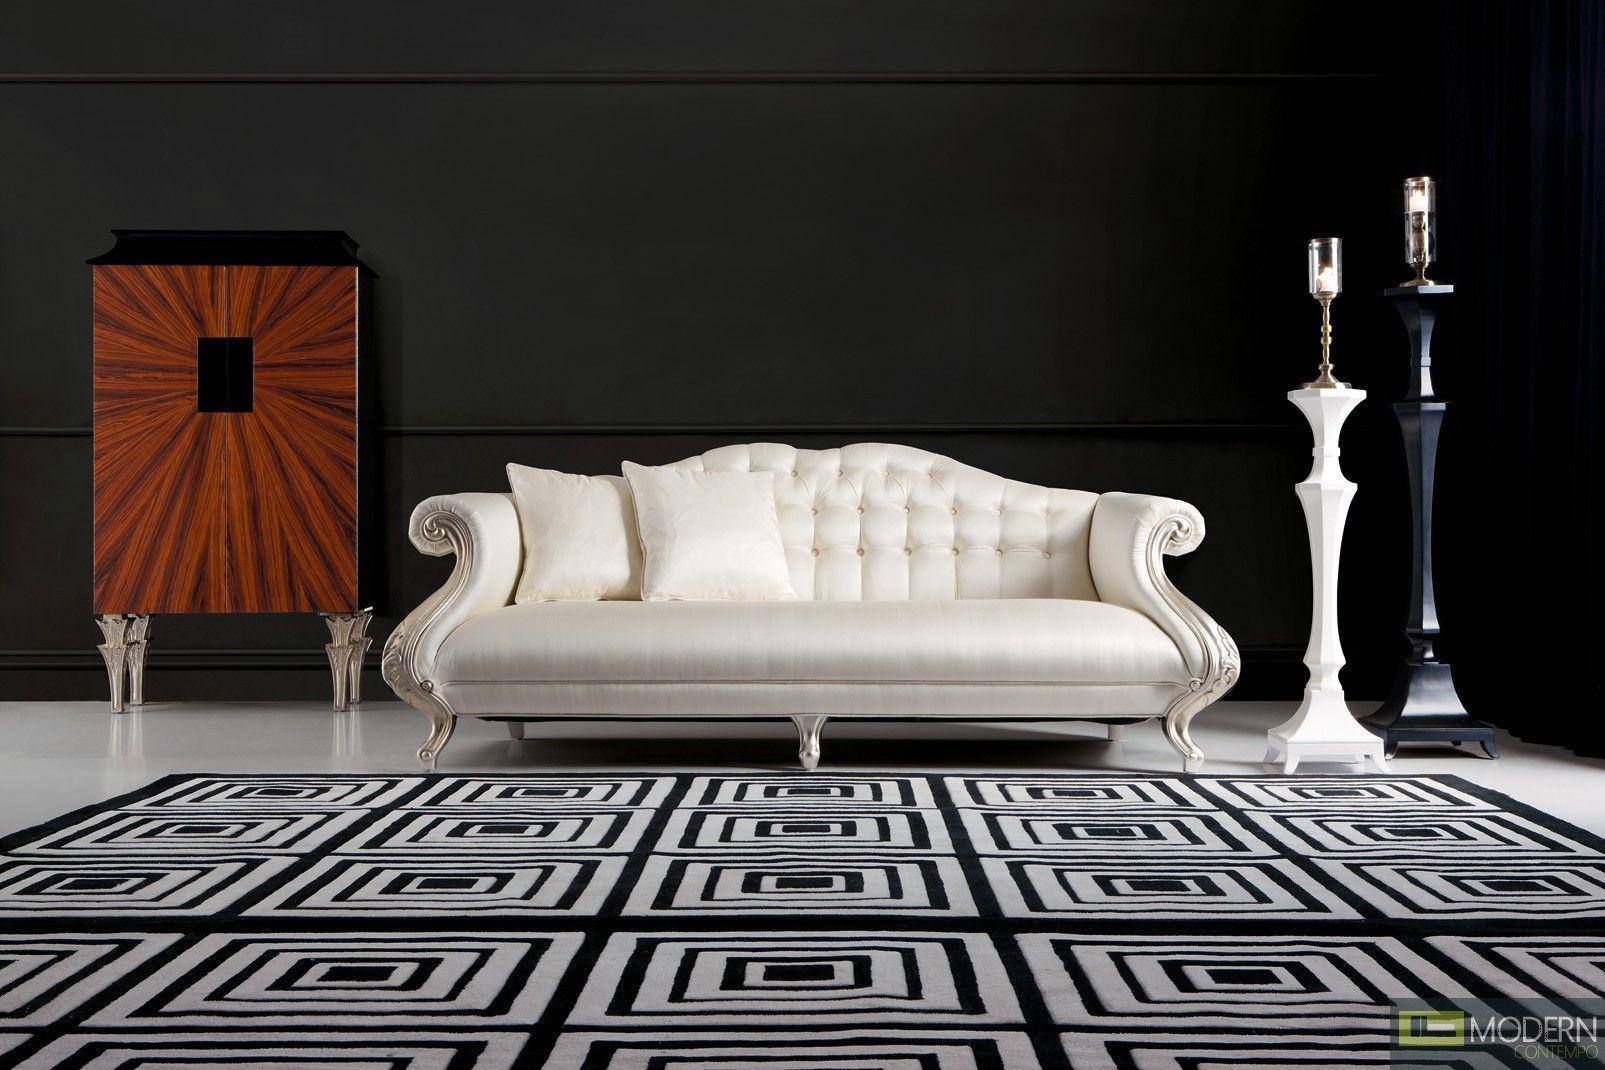 Avellino Neo Classic Luxury Italian Sofa Set 6 895